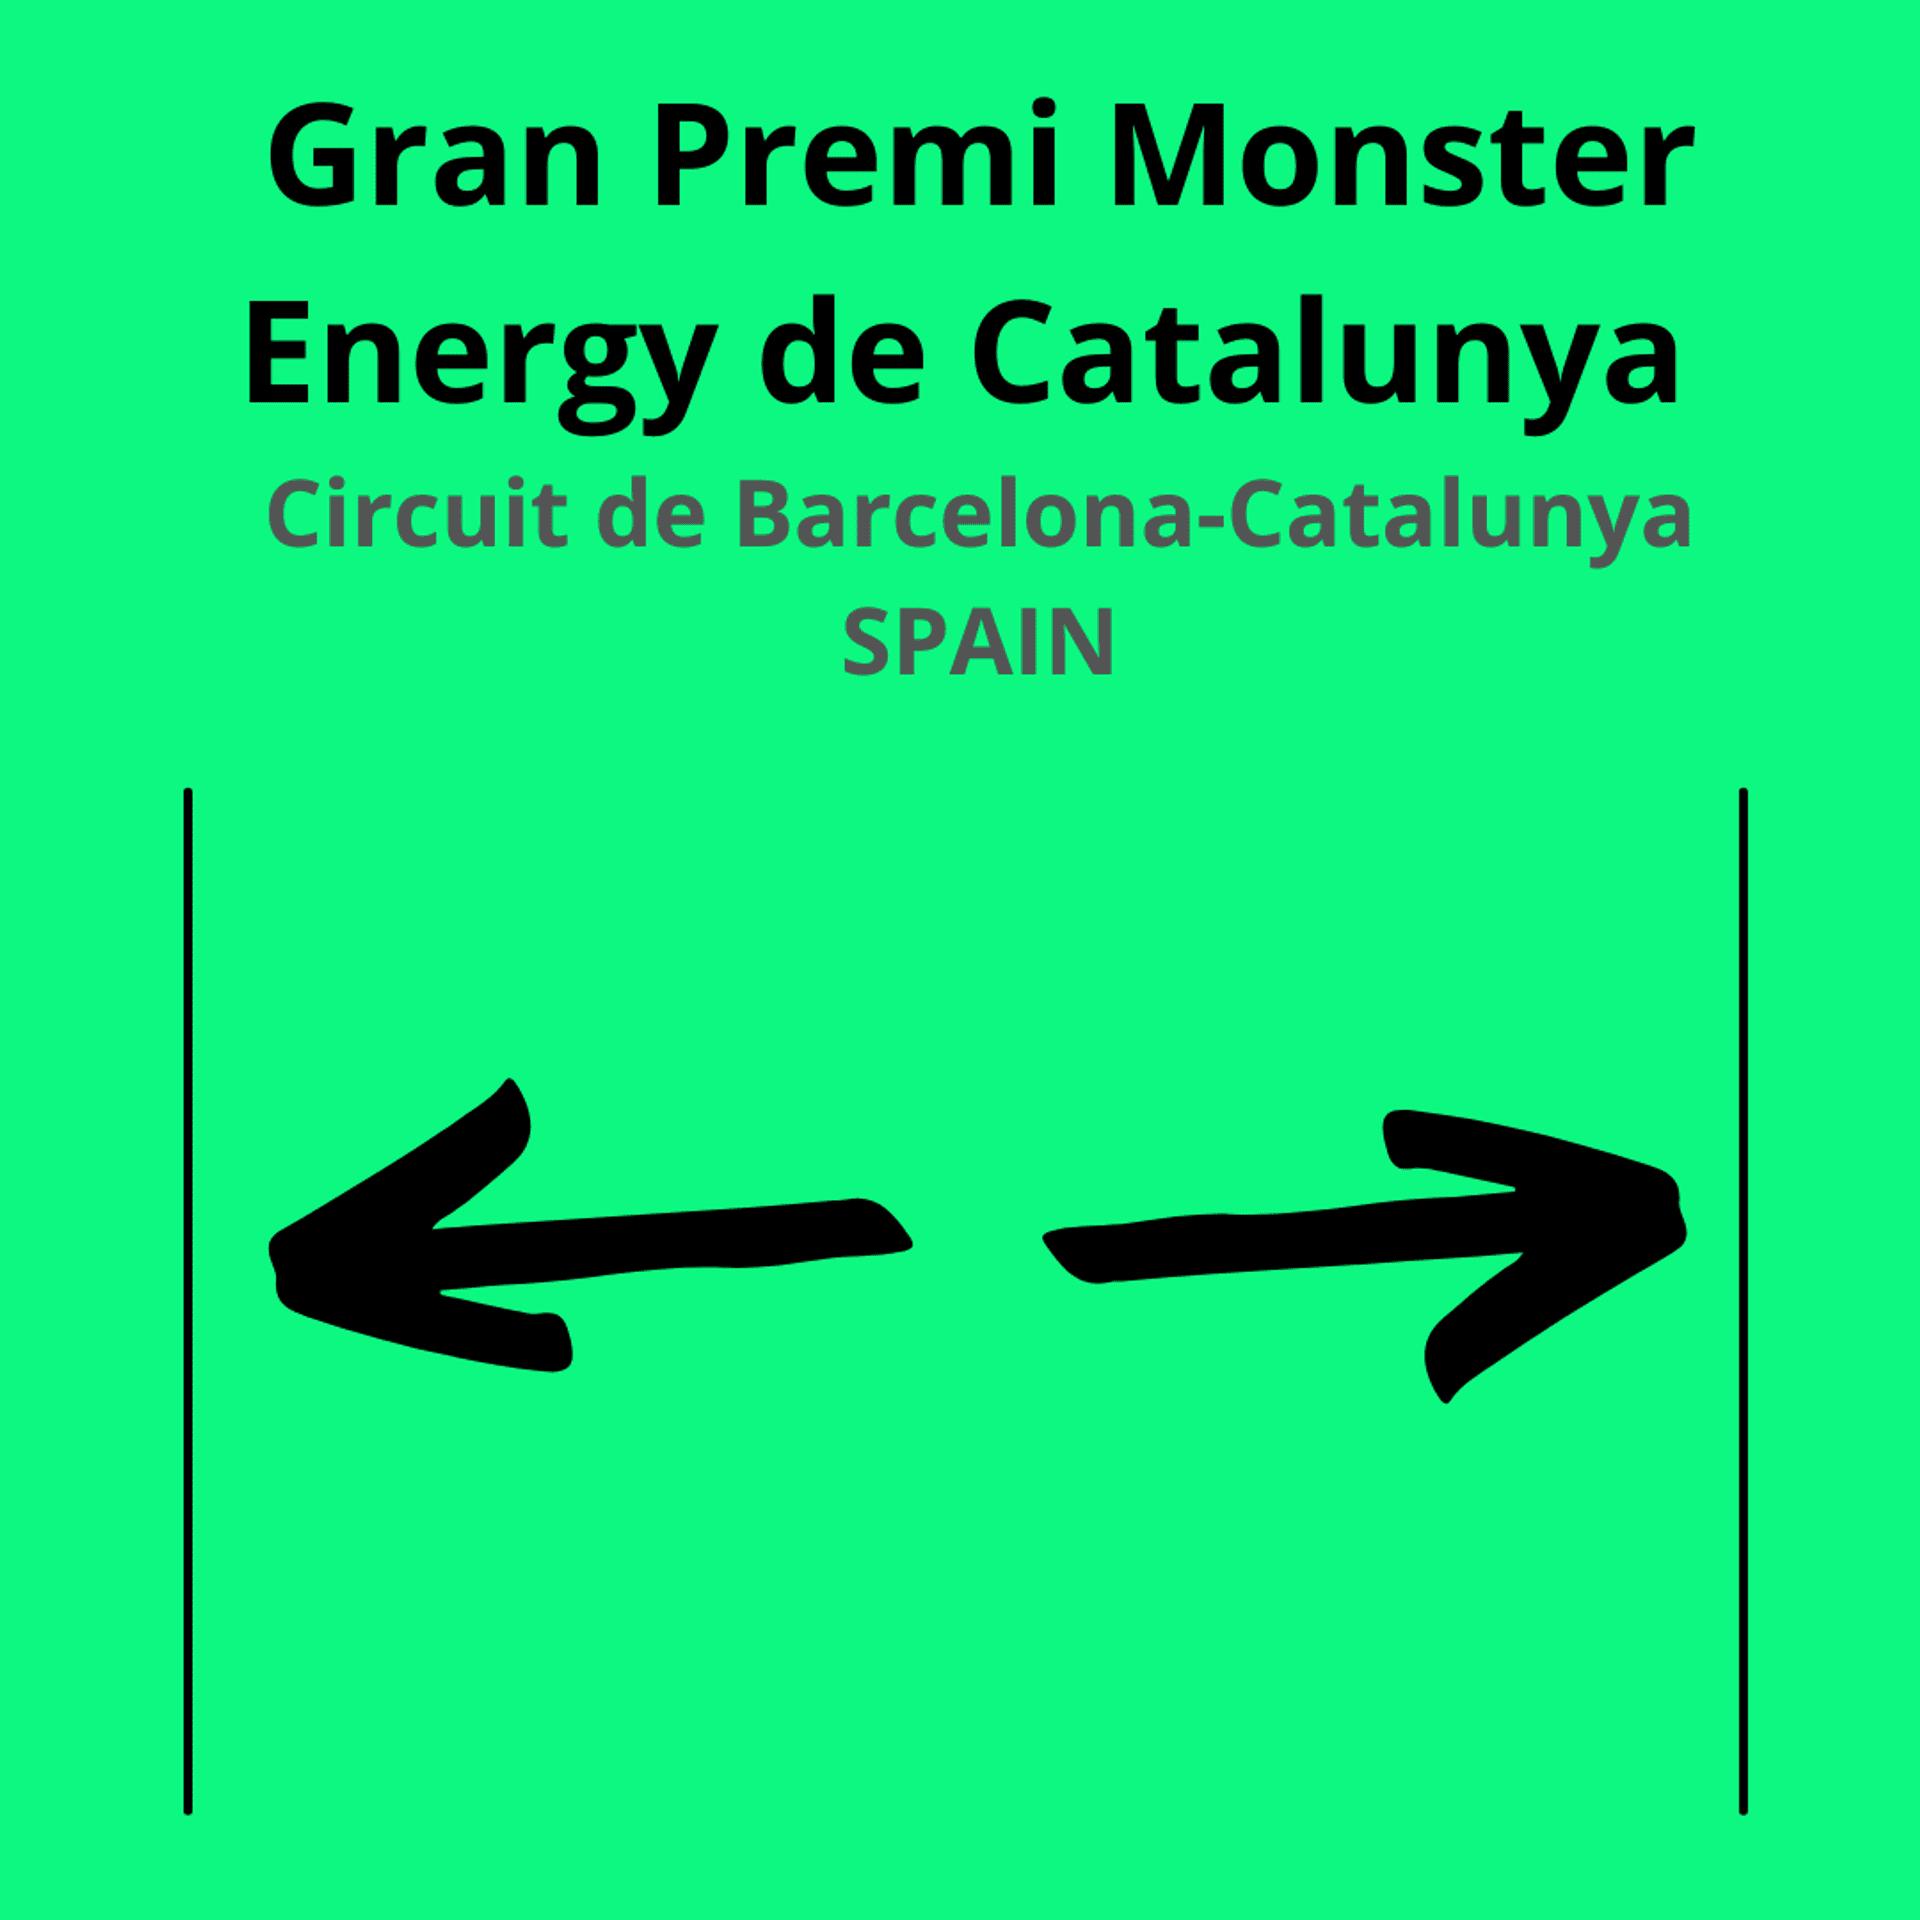 Gran Premi Monster Energy